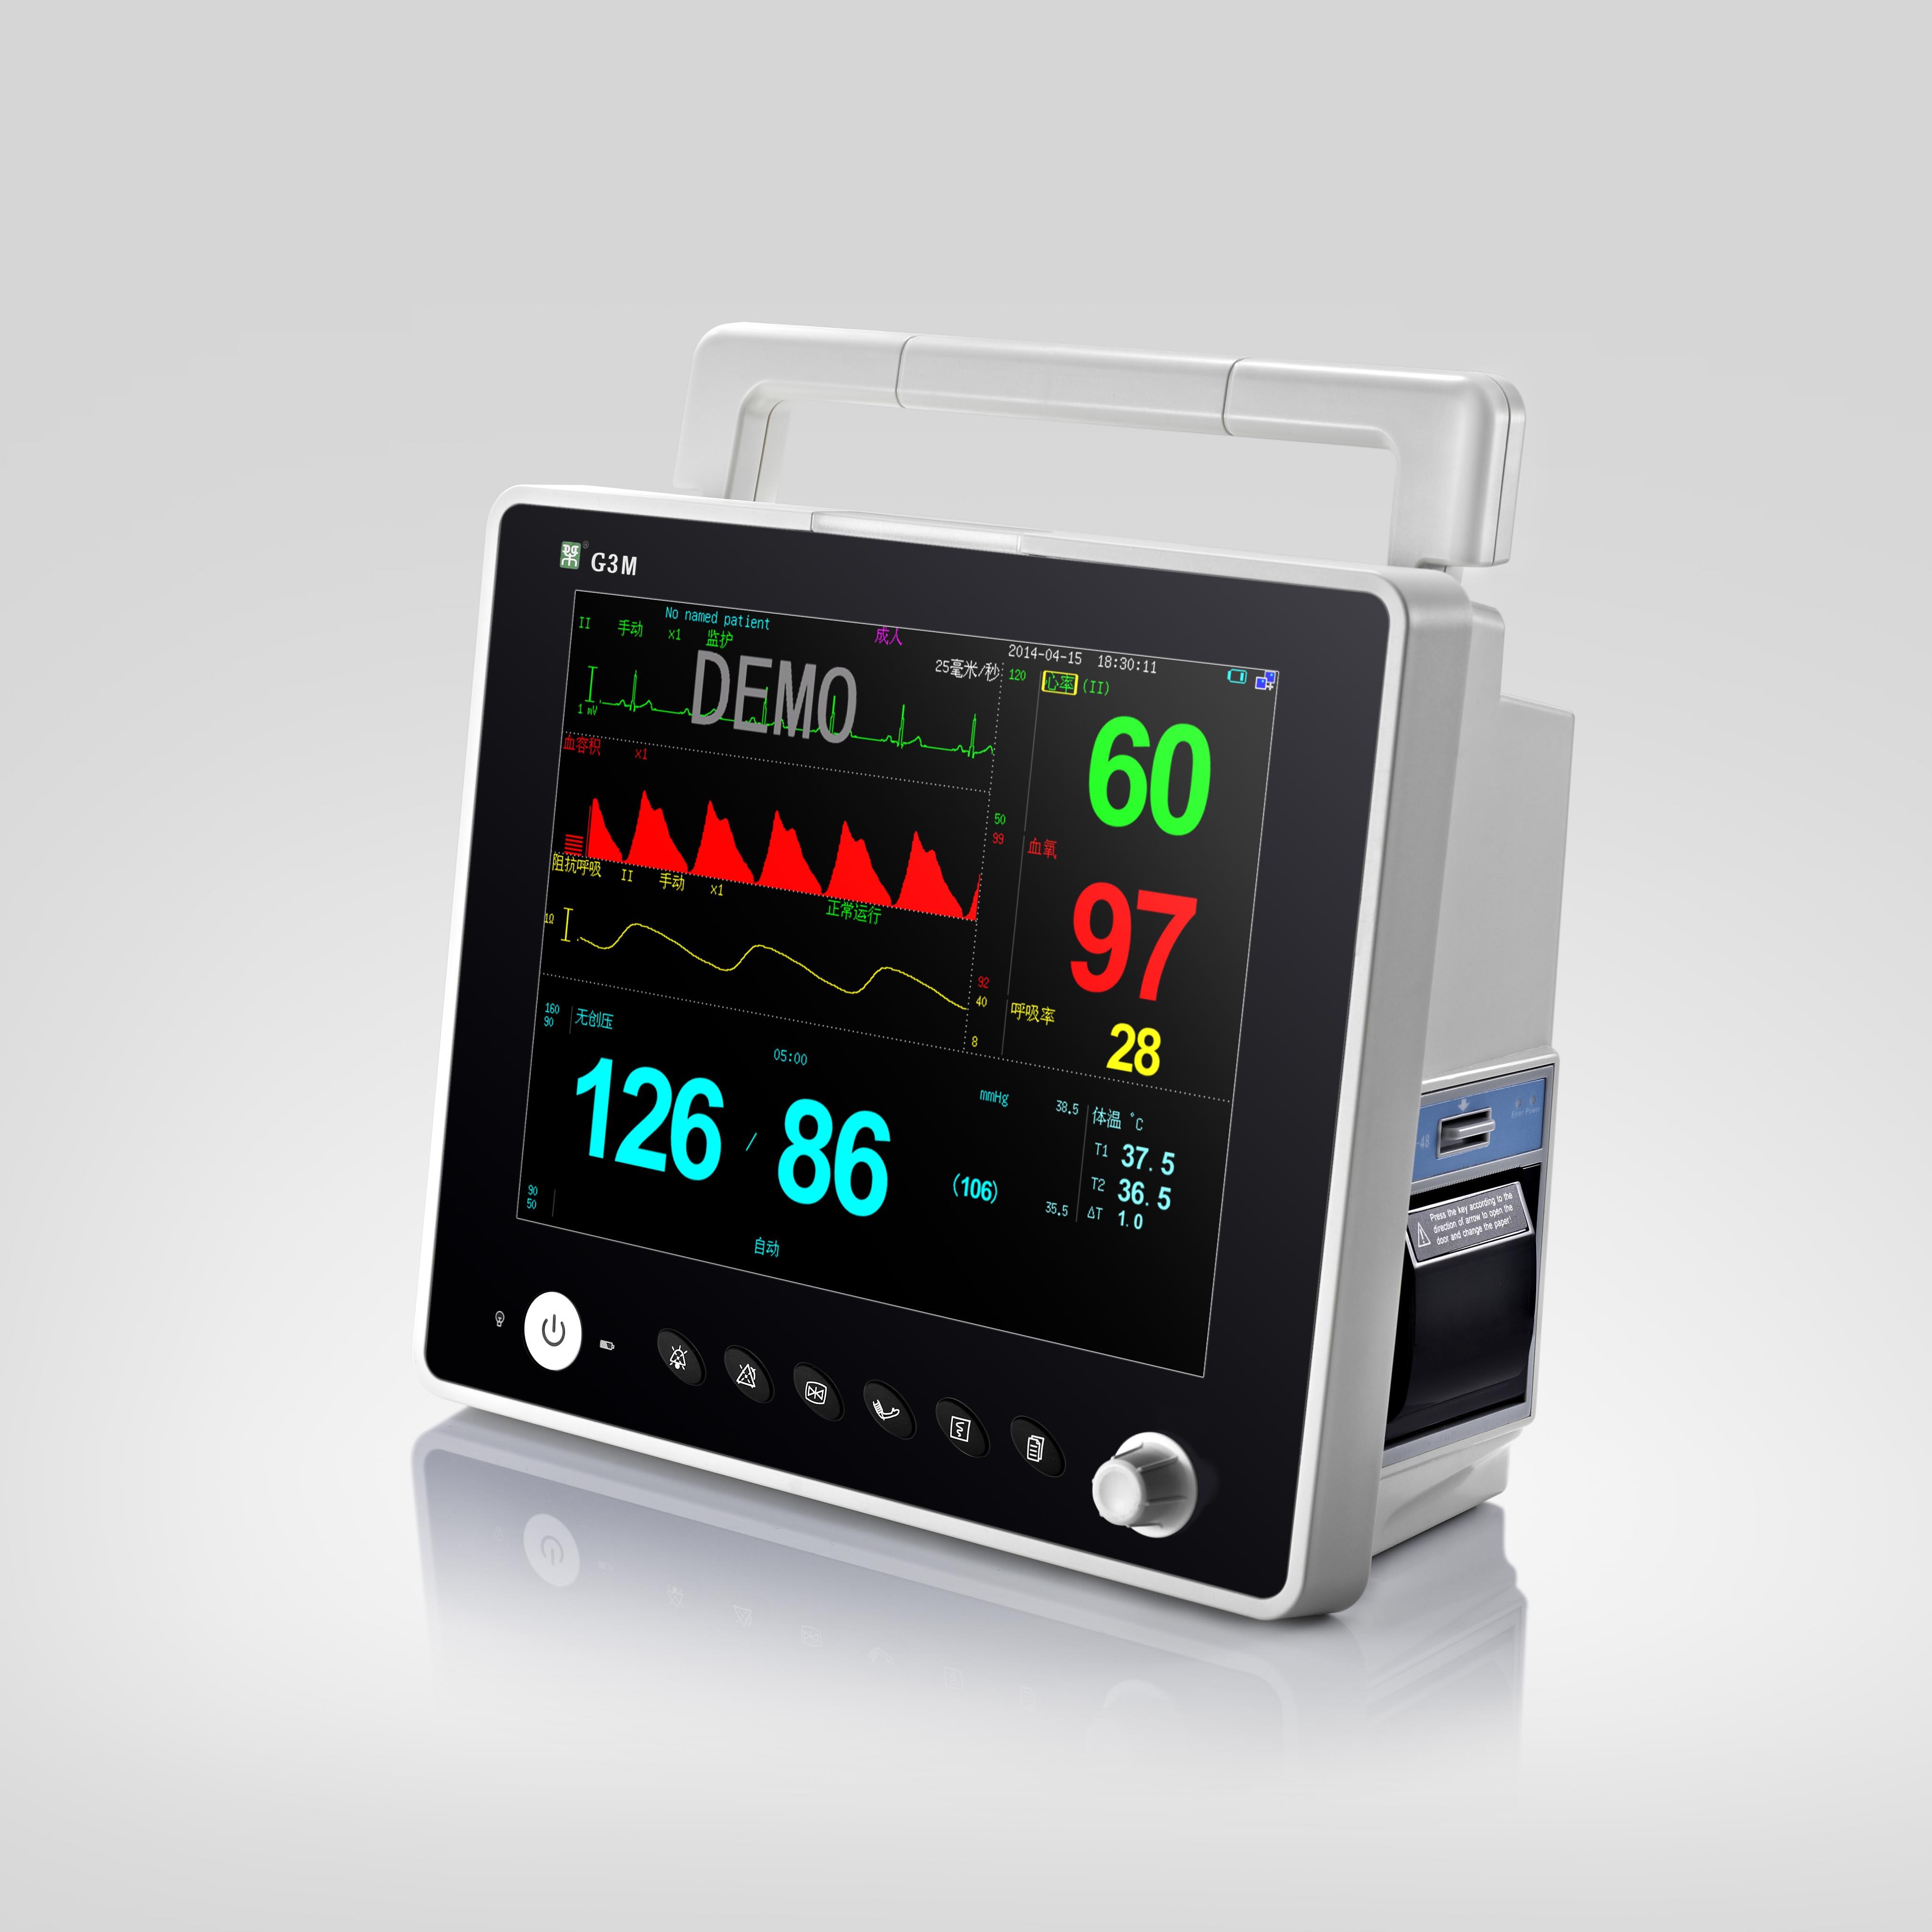 G3M Series Multi-parameter Patient Monitor